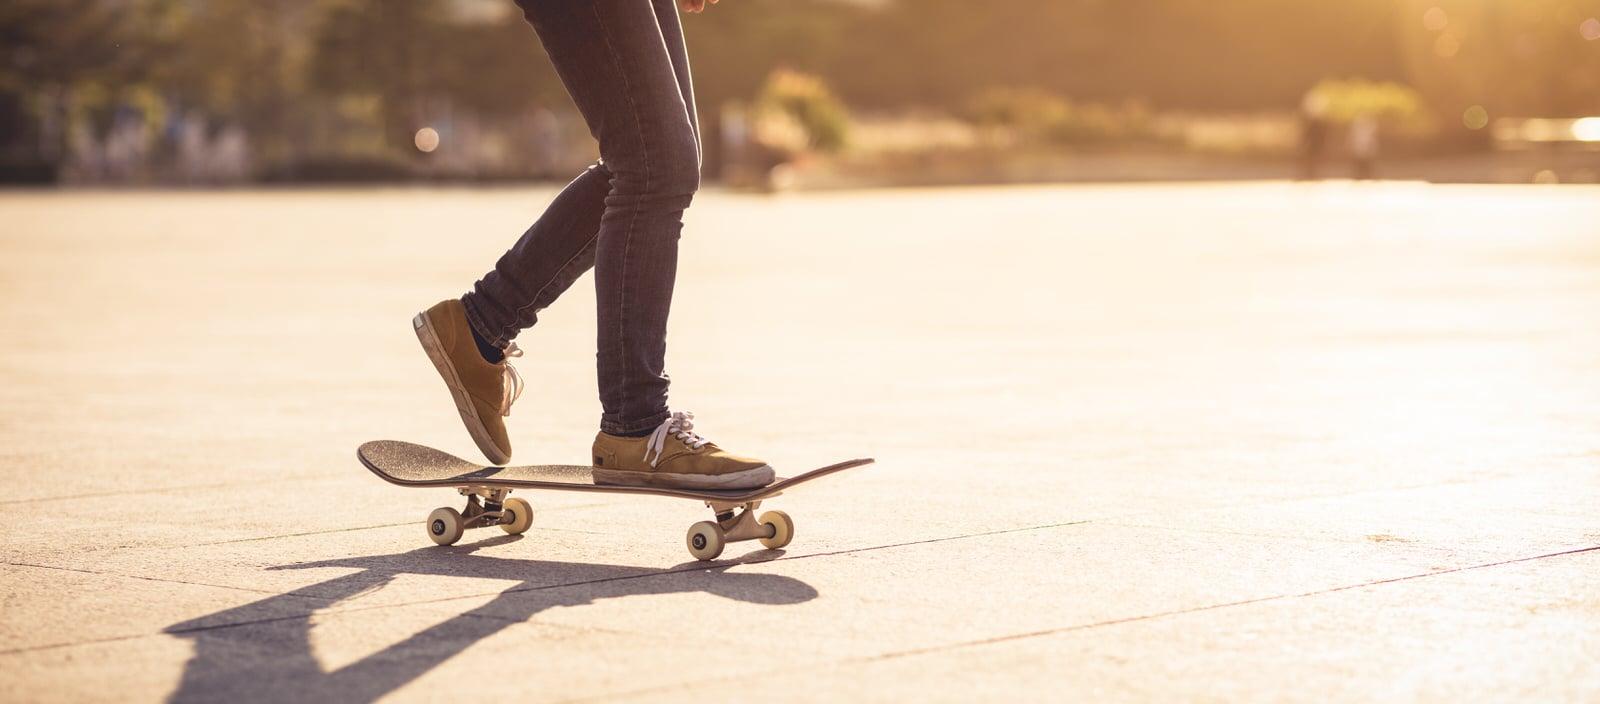 Skateboarder skatet mit seinem Skateboard